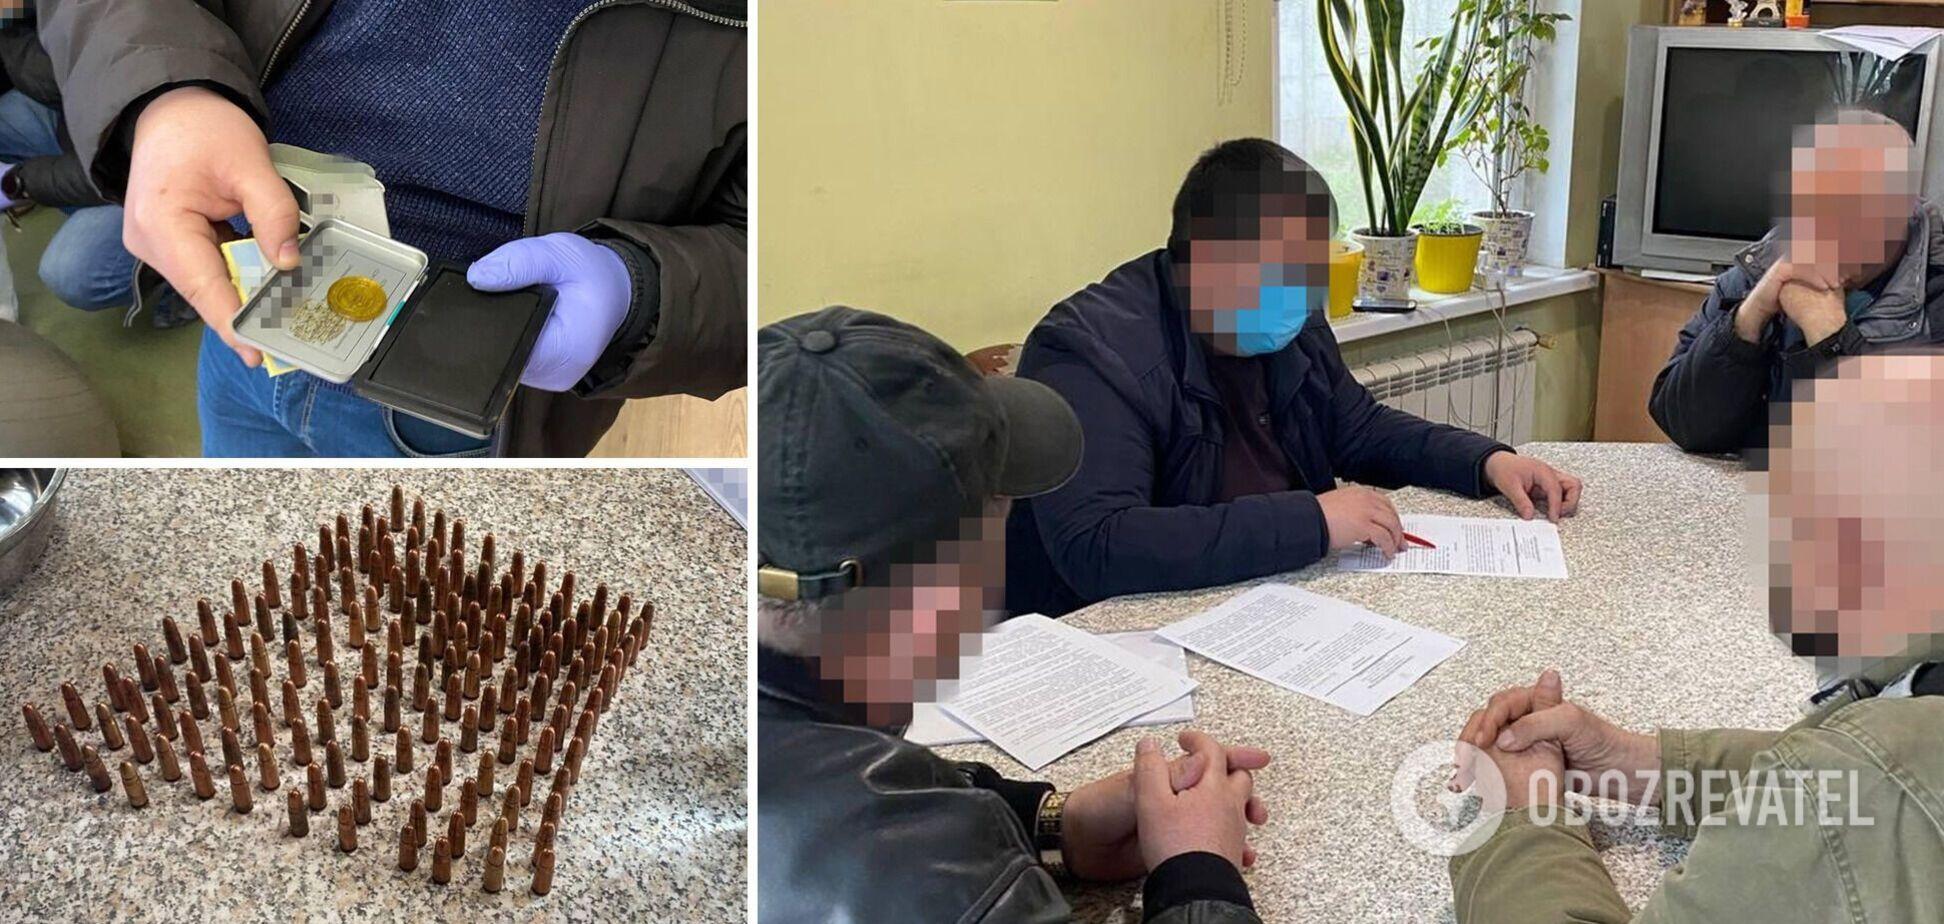 СБУ разоблачила новую схему по легализации иностранцев в Украине